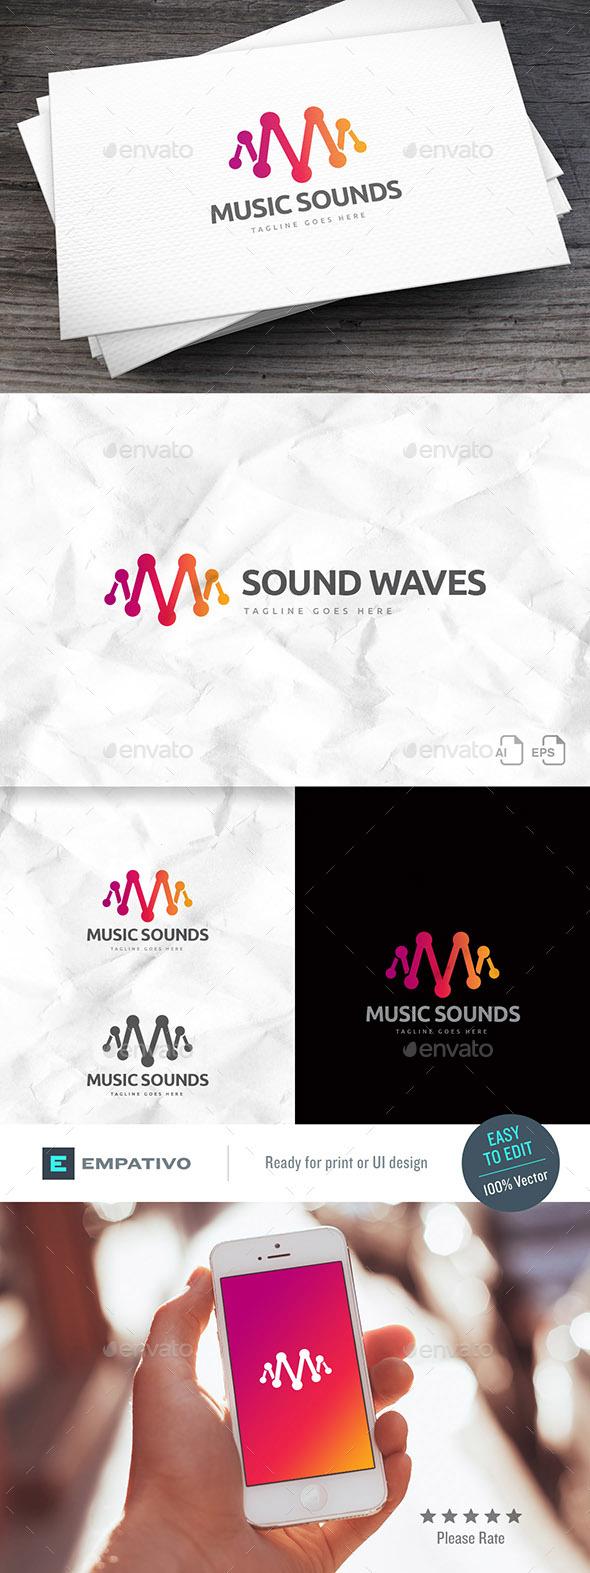 Music Sounds Logo Template